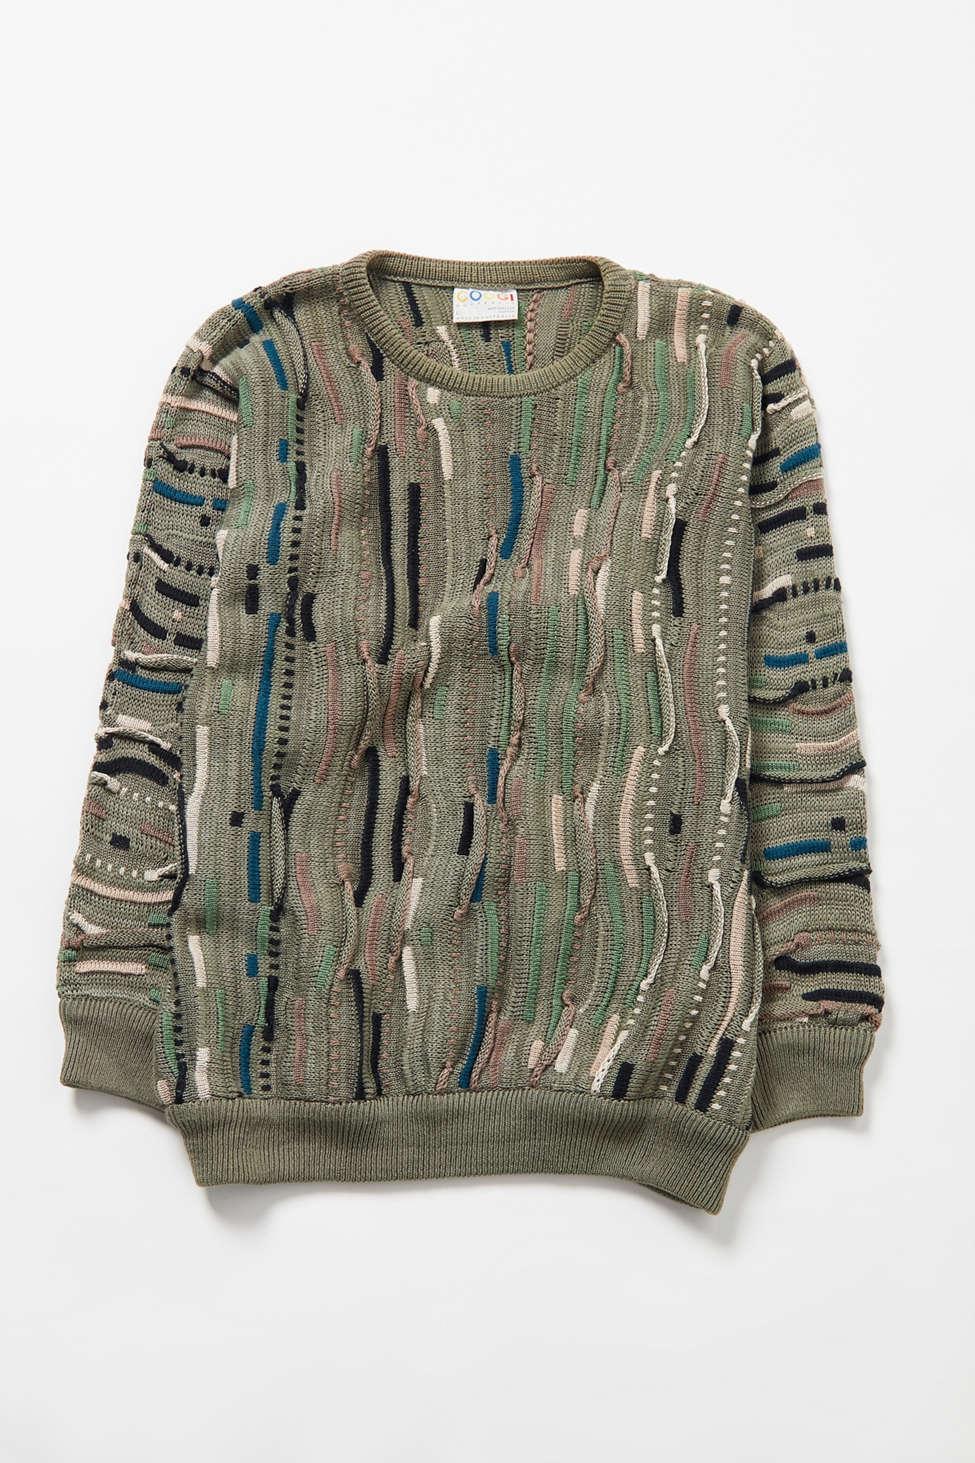 Vintage Coogi Olive Sweater